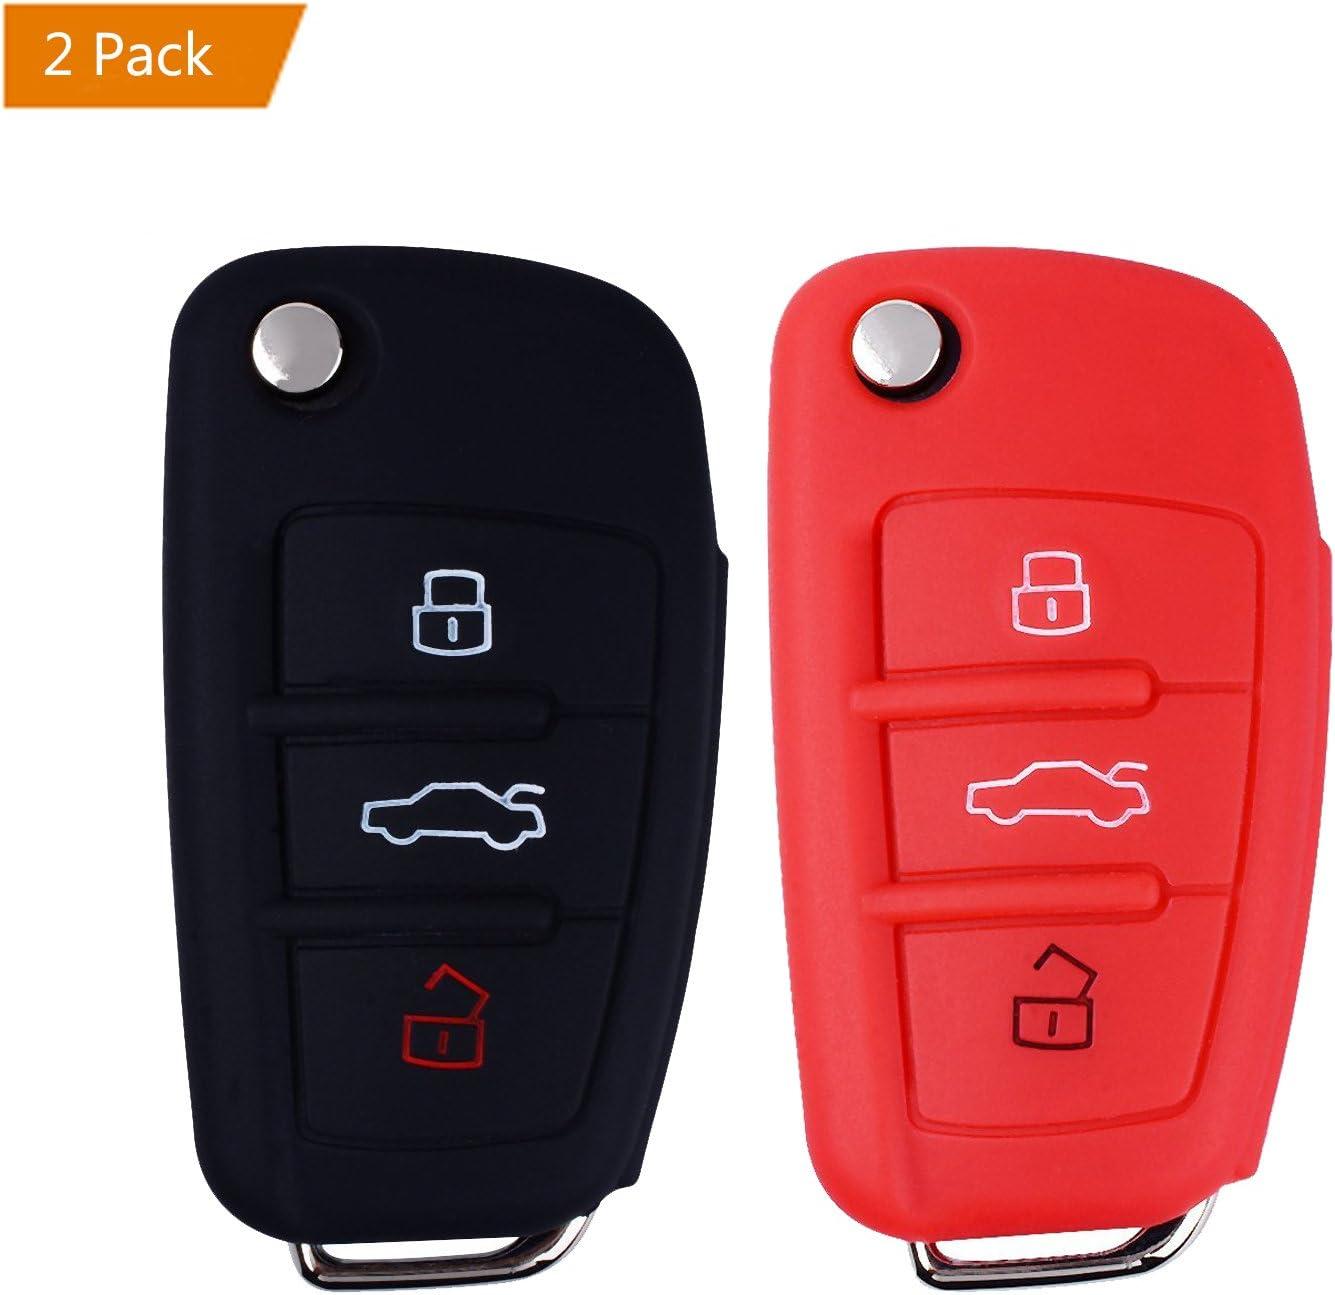 E-Mandala Funda Llave Audi Rosa Negra 3 Botones Llave Carcasa in Silicona para Coche Audi A3 S3 A4 S4 RS4 A6 S6 RS6 Q7 TT TTS R8 Cover de Llave Car Key Case